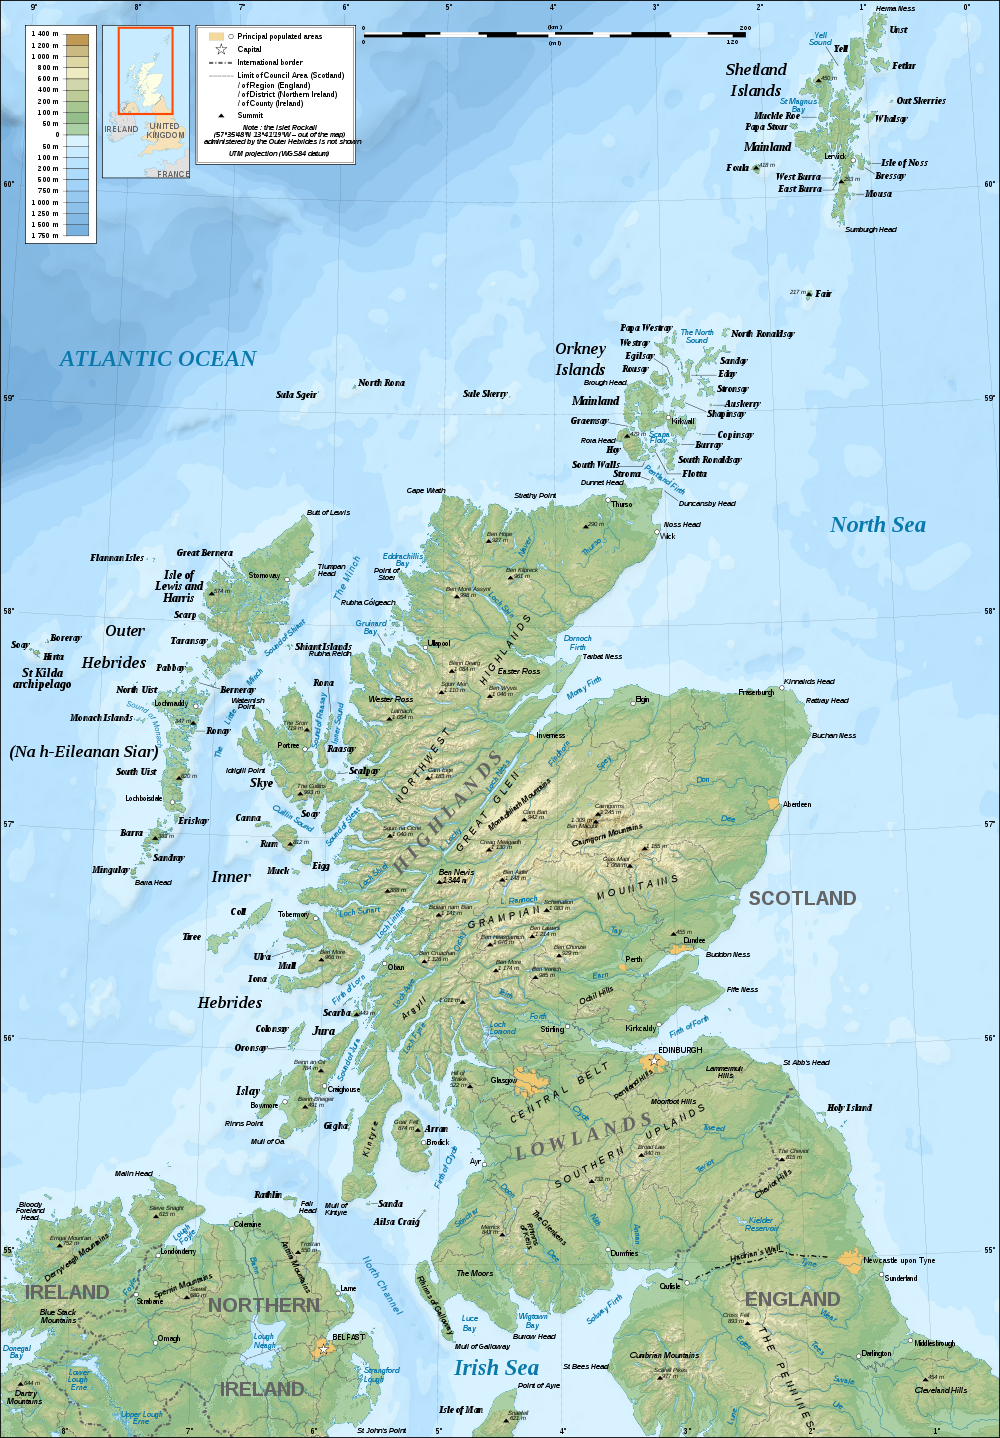 landkarte schottland topographische karte karten und stadtpl ne der welt. Black Bedroom Furniture Sets. Home Design Ideas